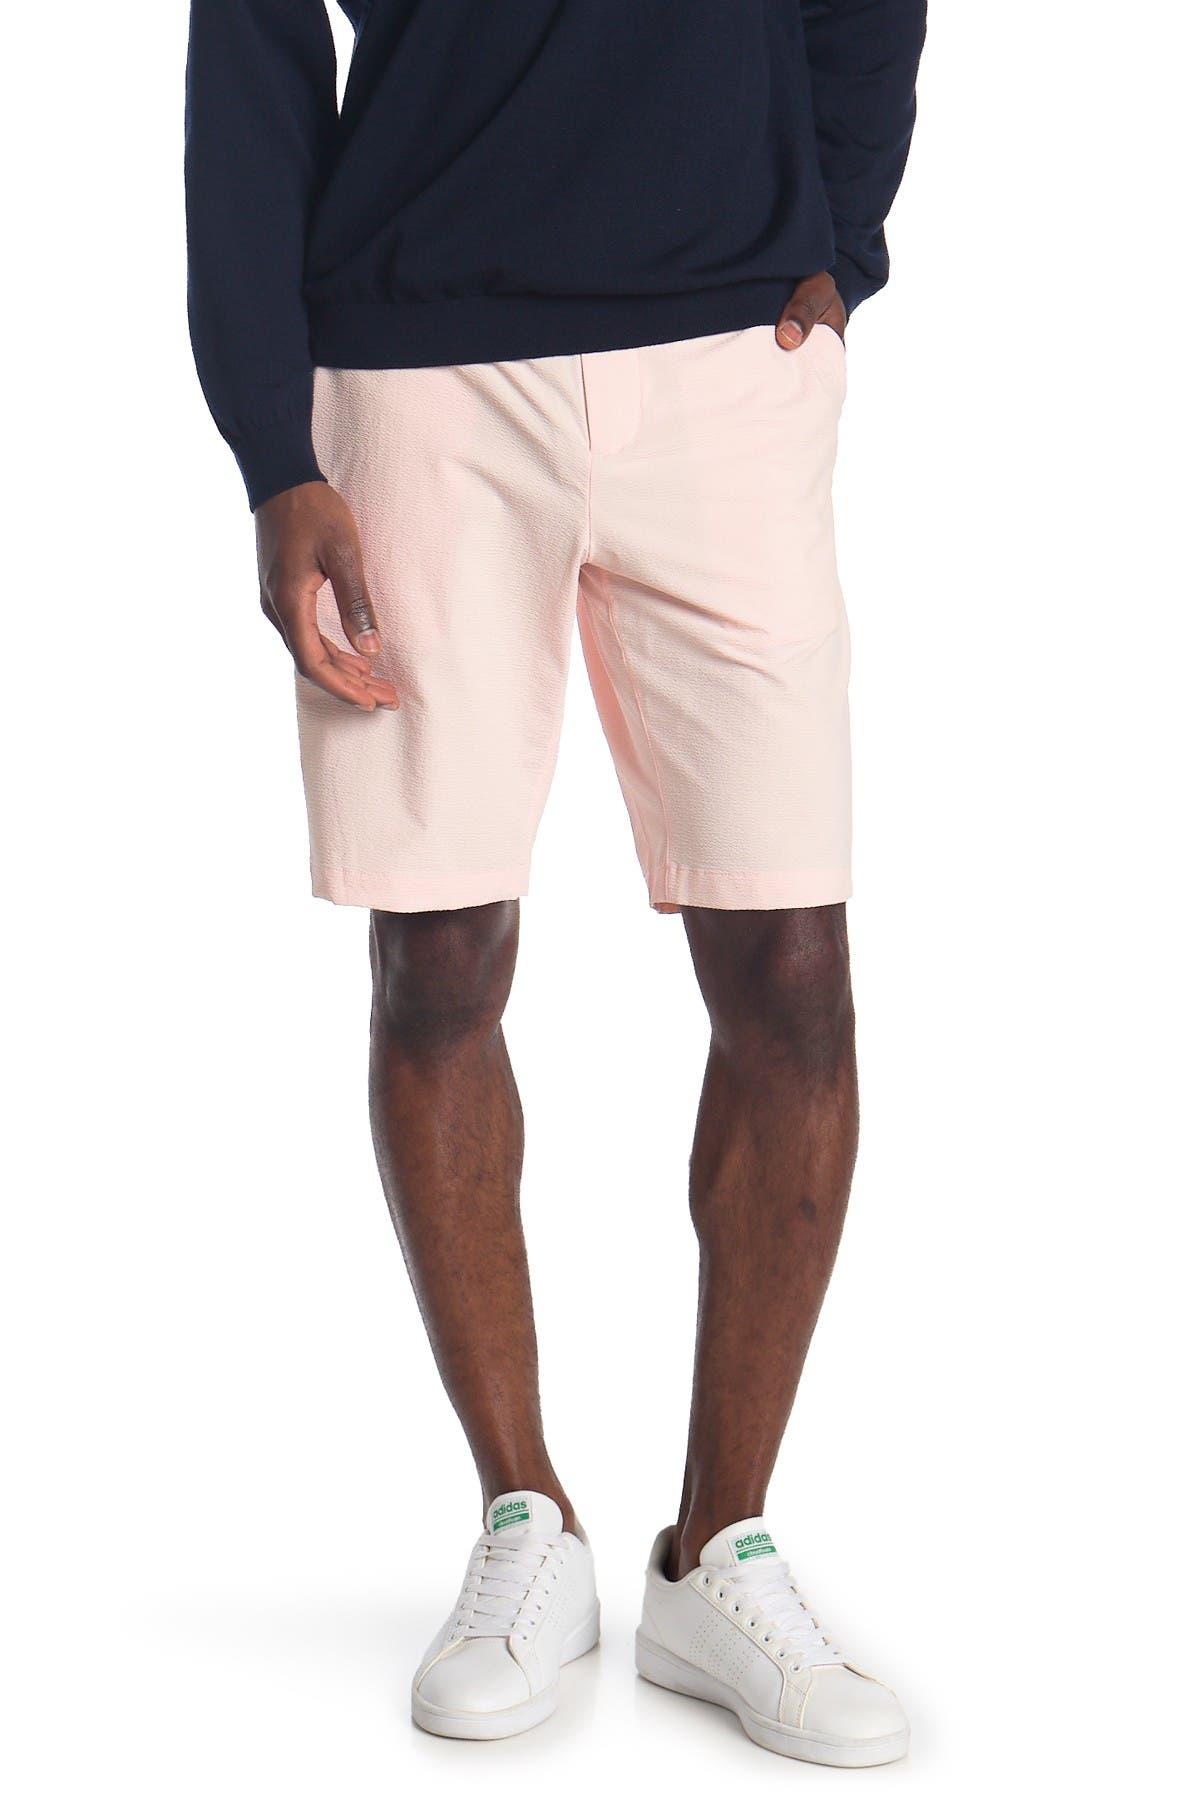 Adidas Colored Golf Shorts